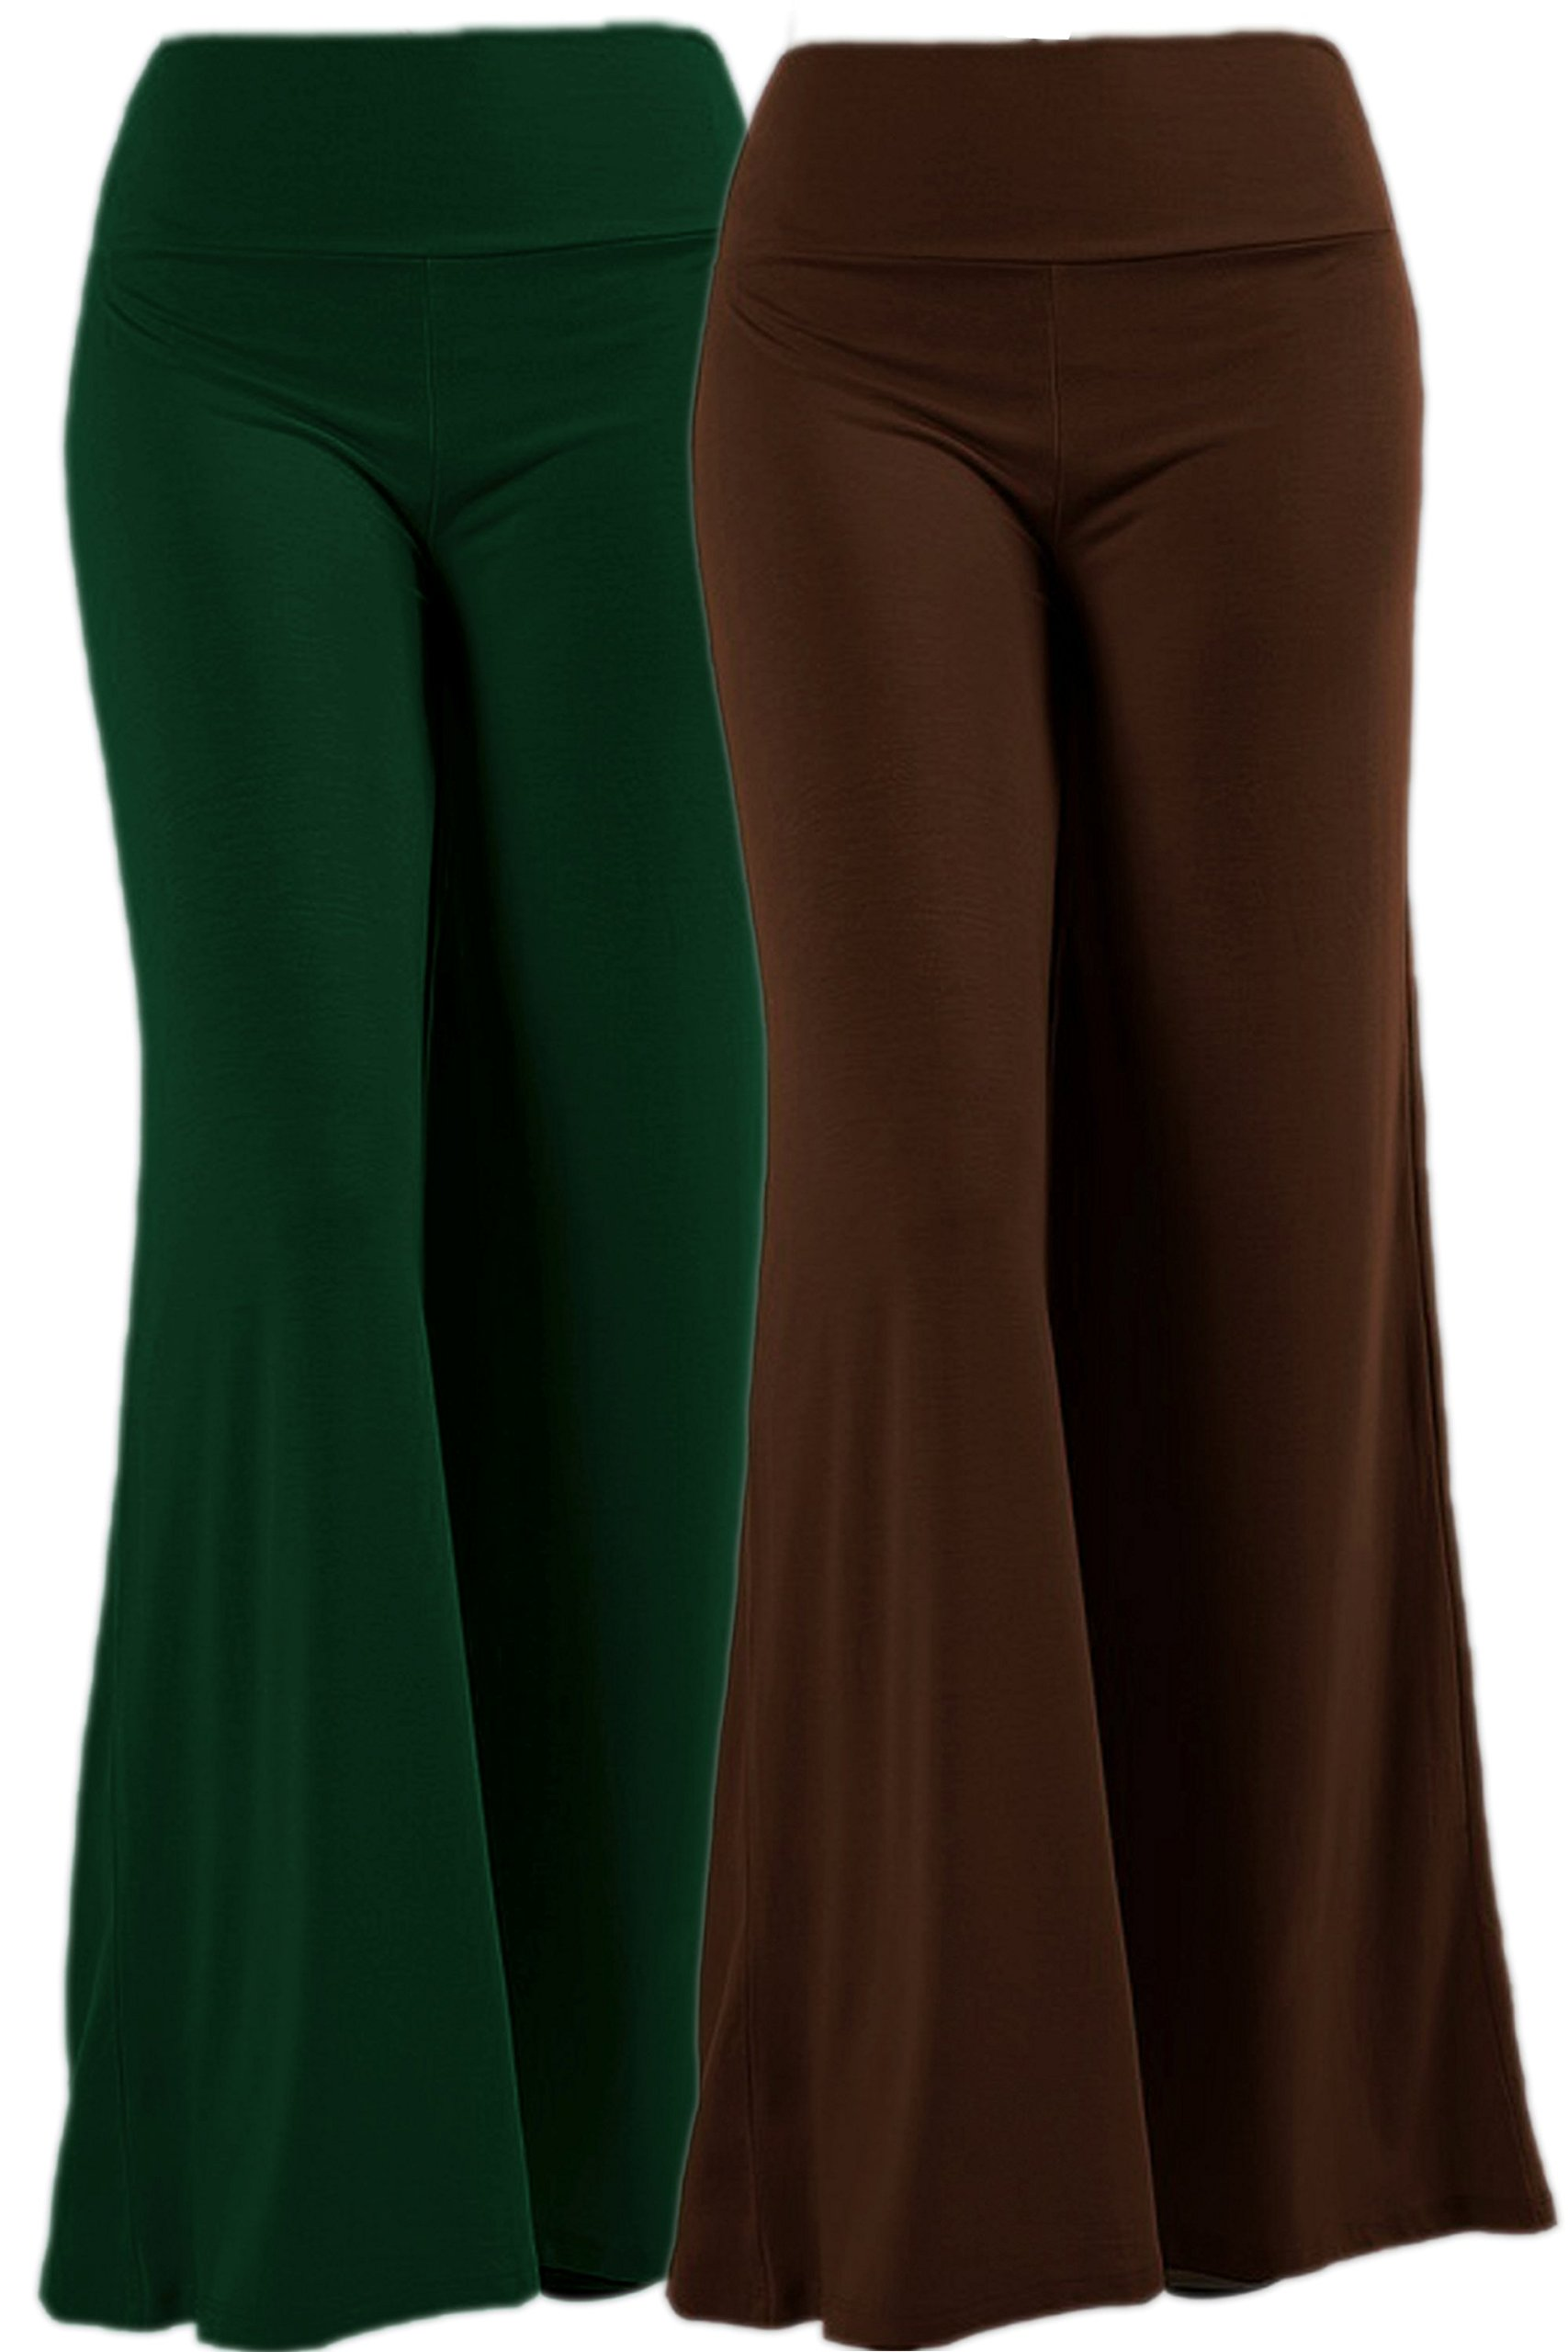 TOP LEGGING TL Women's Versatile Comfy Wide Leg Long Maternity Palazzo Gaucho Lounge Pants 79PSET2_Hunt_Ameri XL